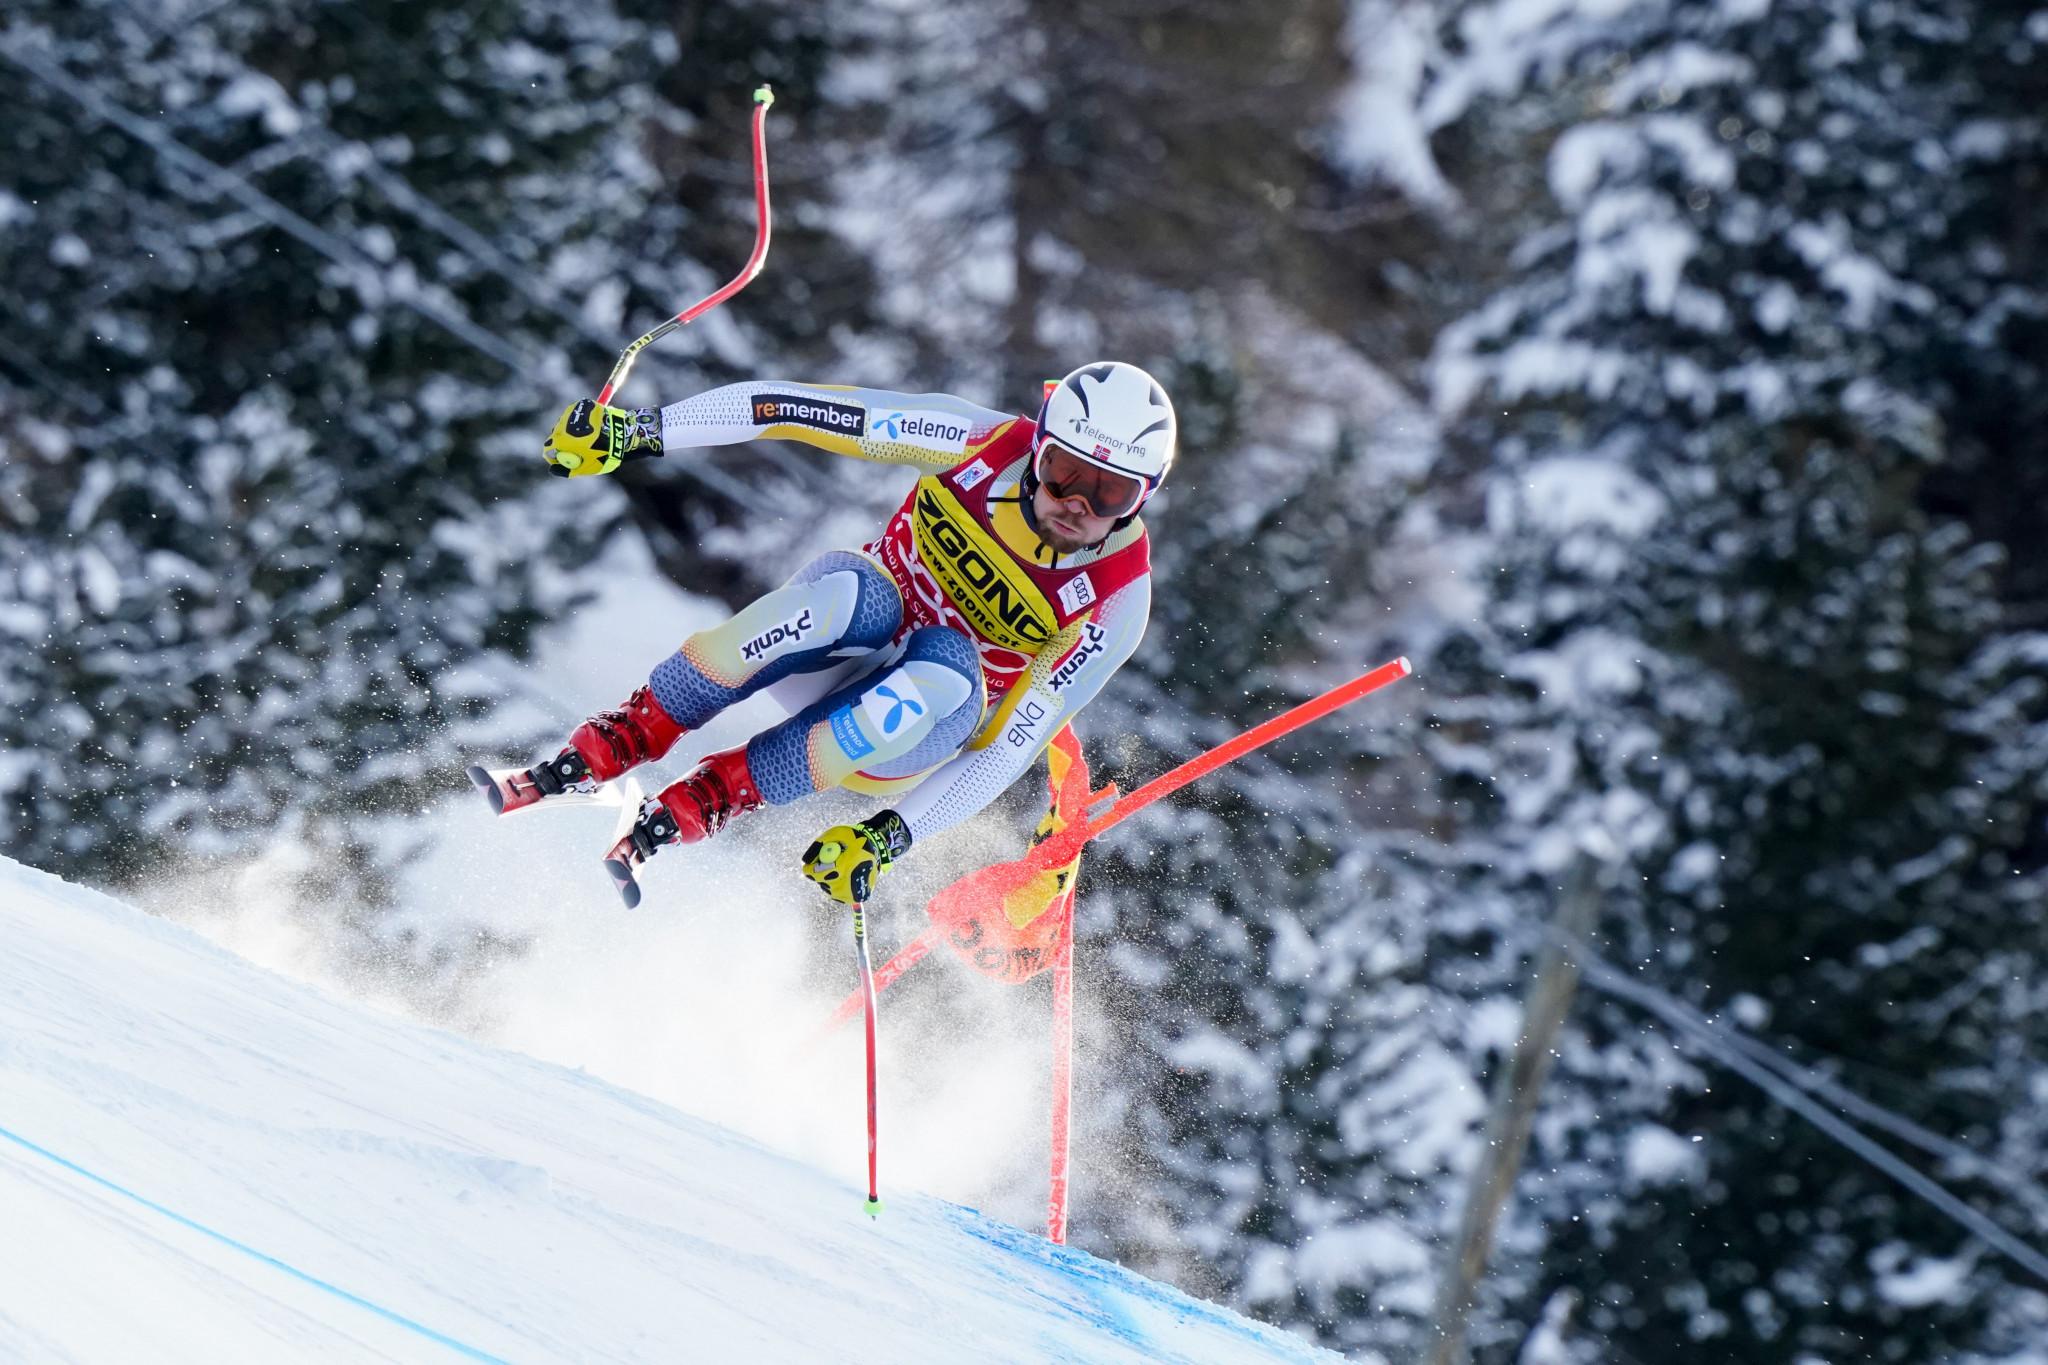 Kilde awarded with Val Gardena Südtirol Ski Trophy